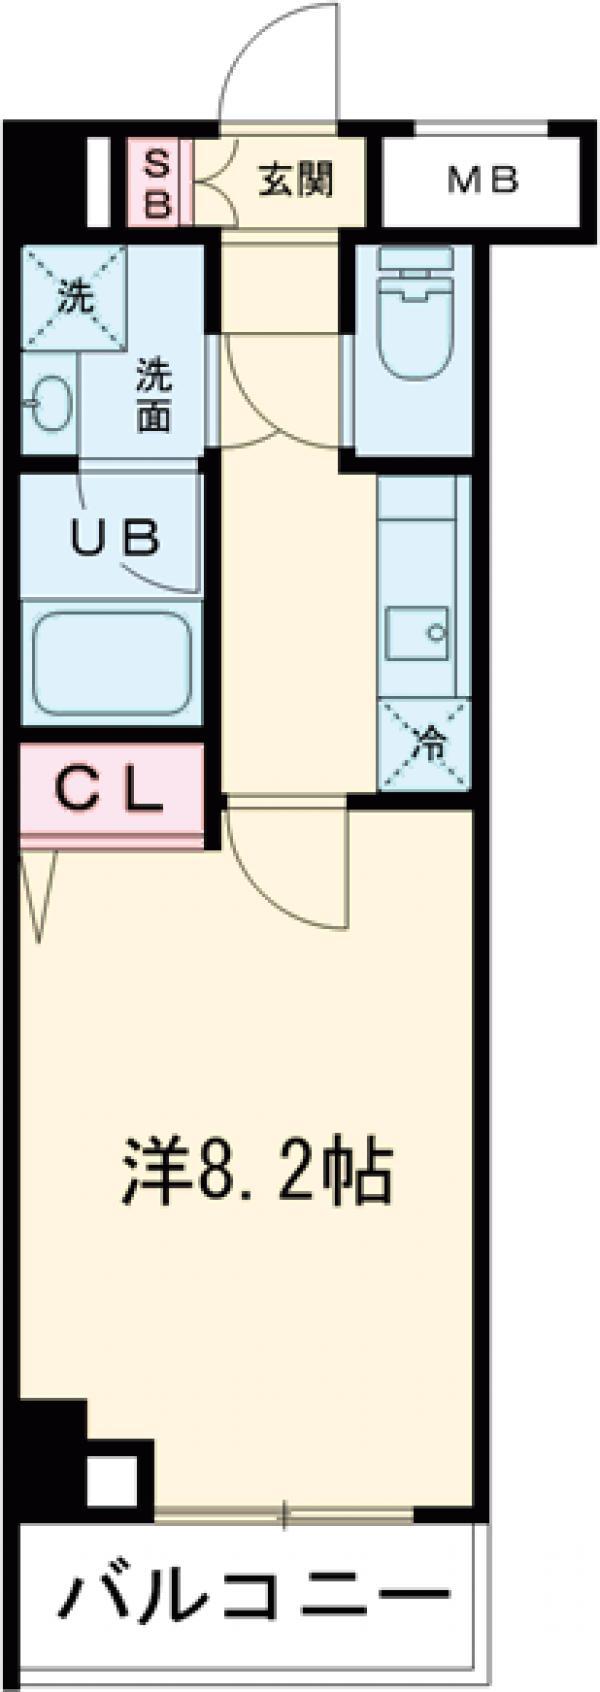 GENOVIA西高島平skygarden・406号室の間取り